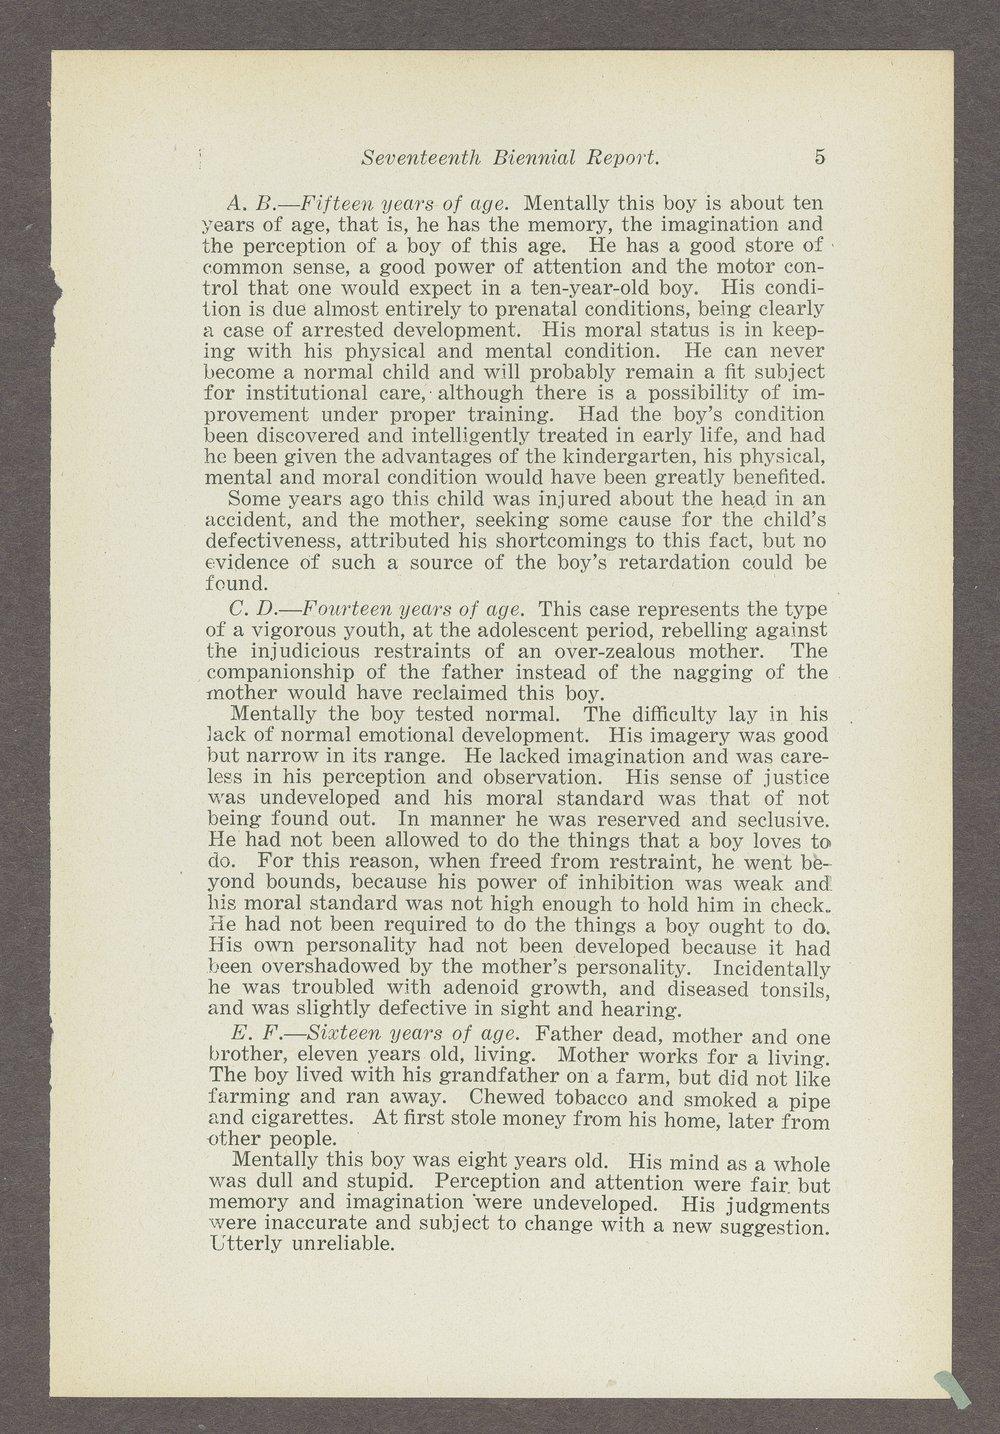 Biennial report of the Boys Industrial School, 1914 - 5